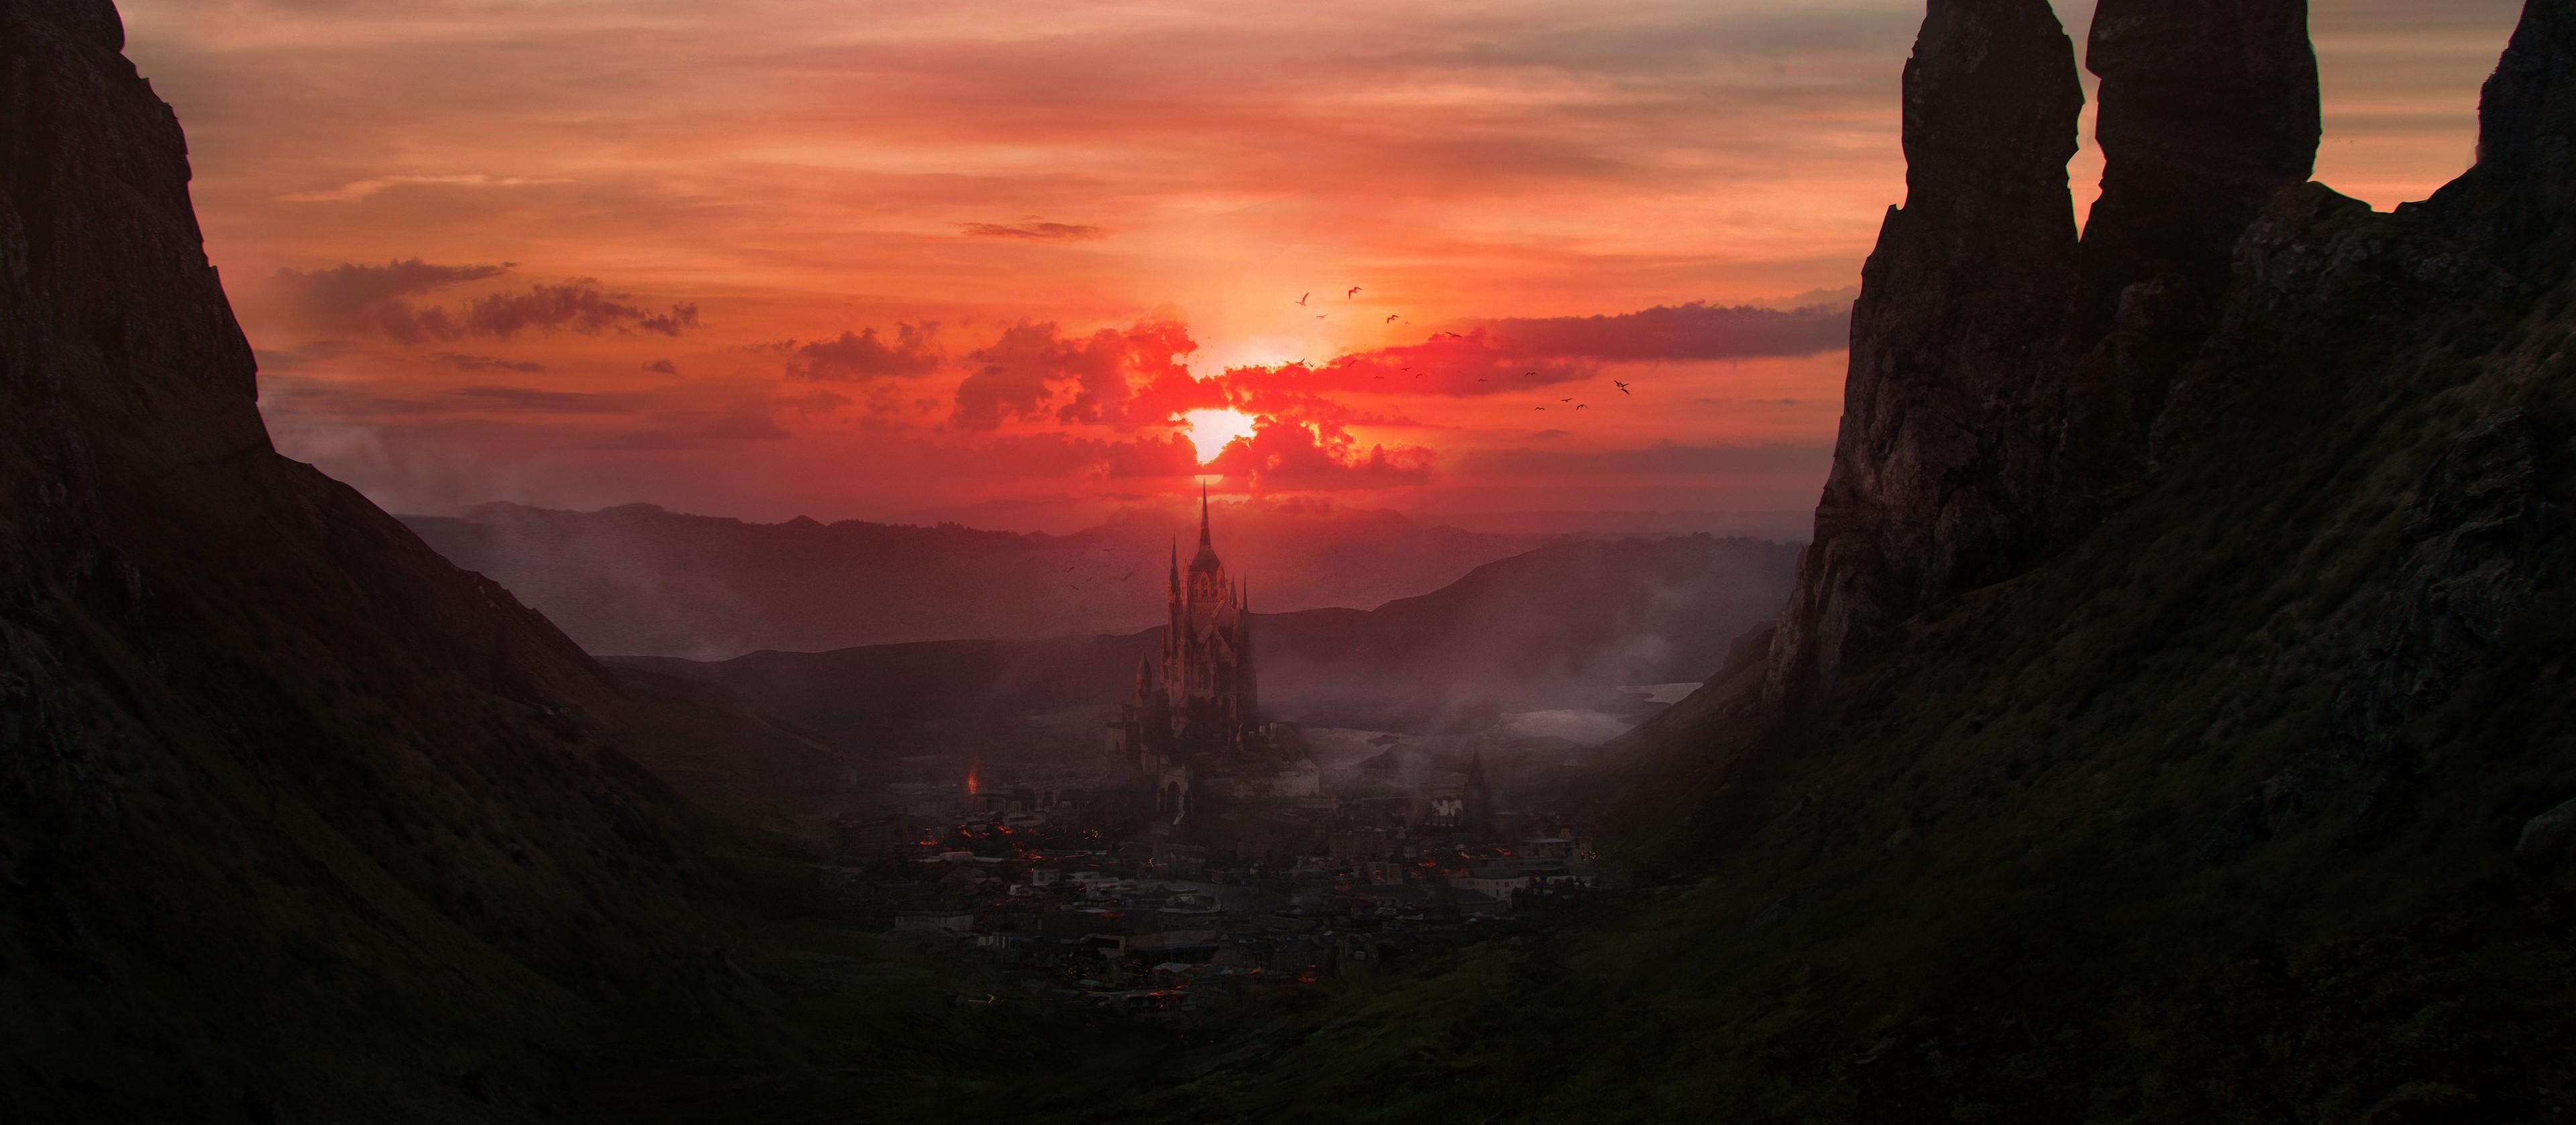 General 3840x1677 Santa Norvaisaite digital fantasy city Sun artwork sky sunlight dark